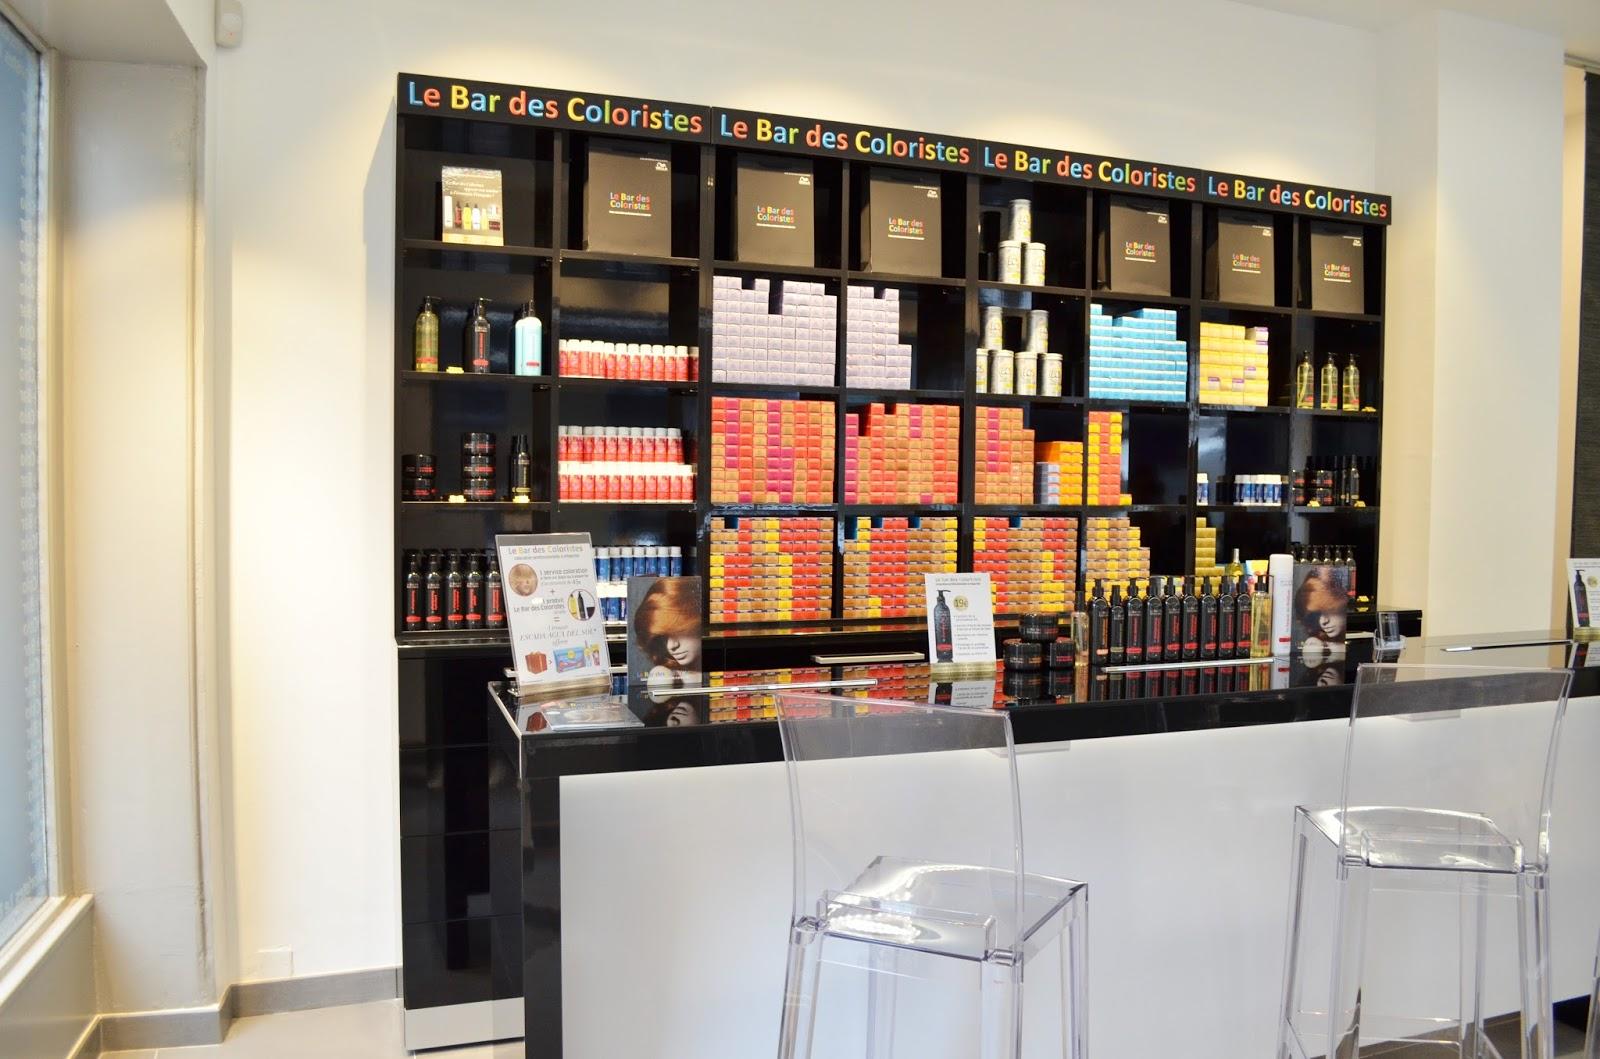 le bar des coloristes - Bar Des Coloristes